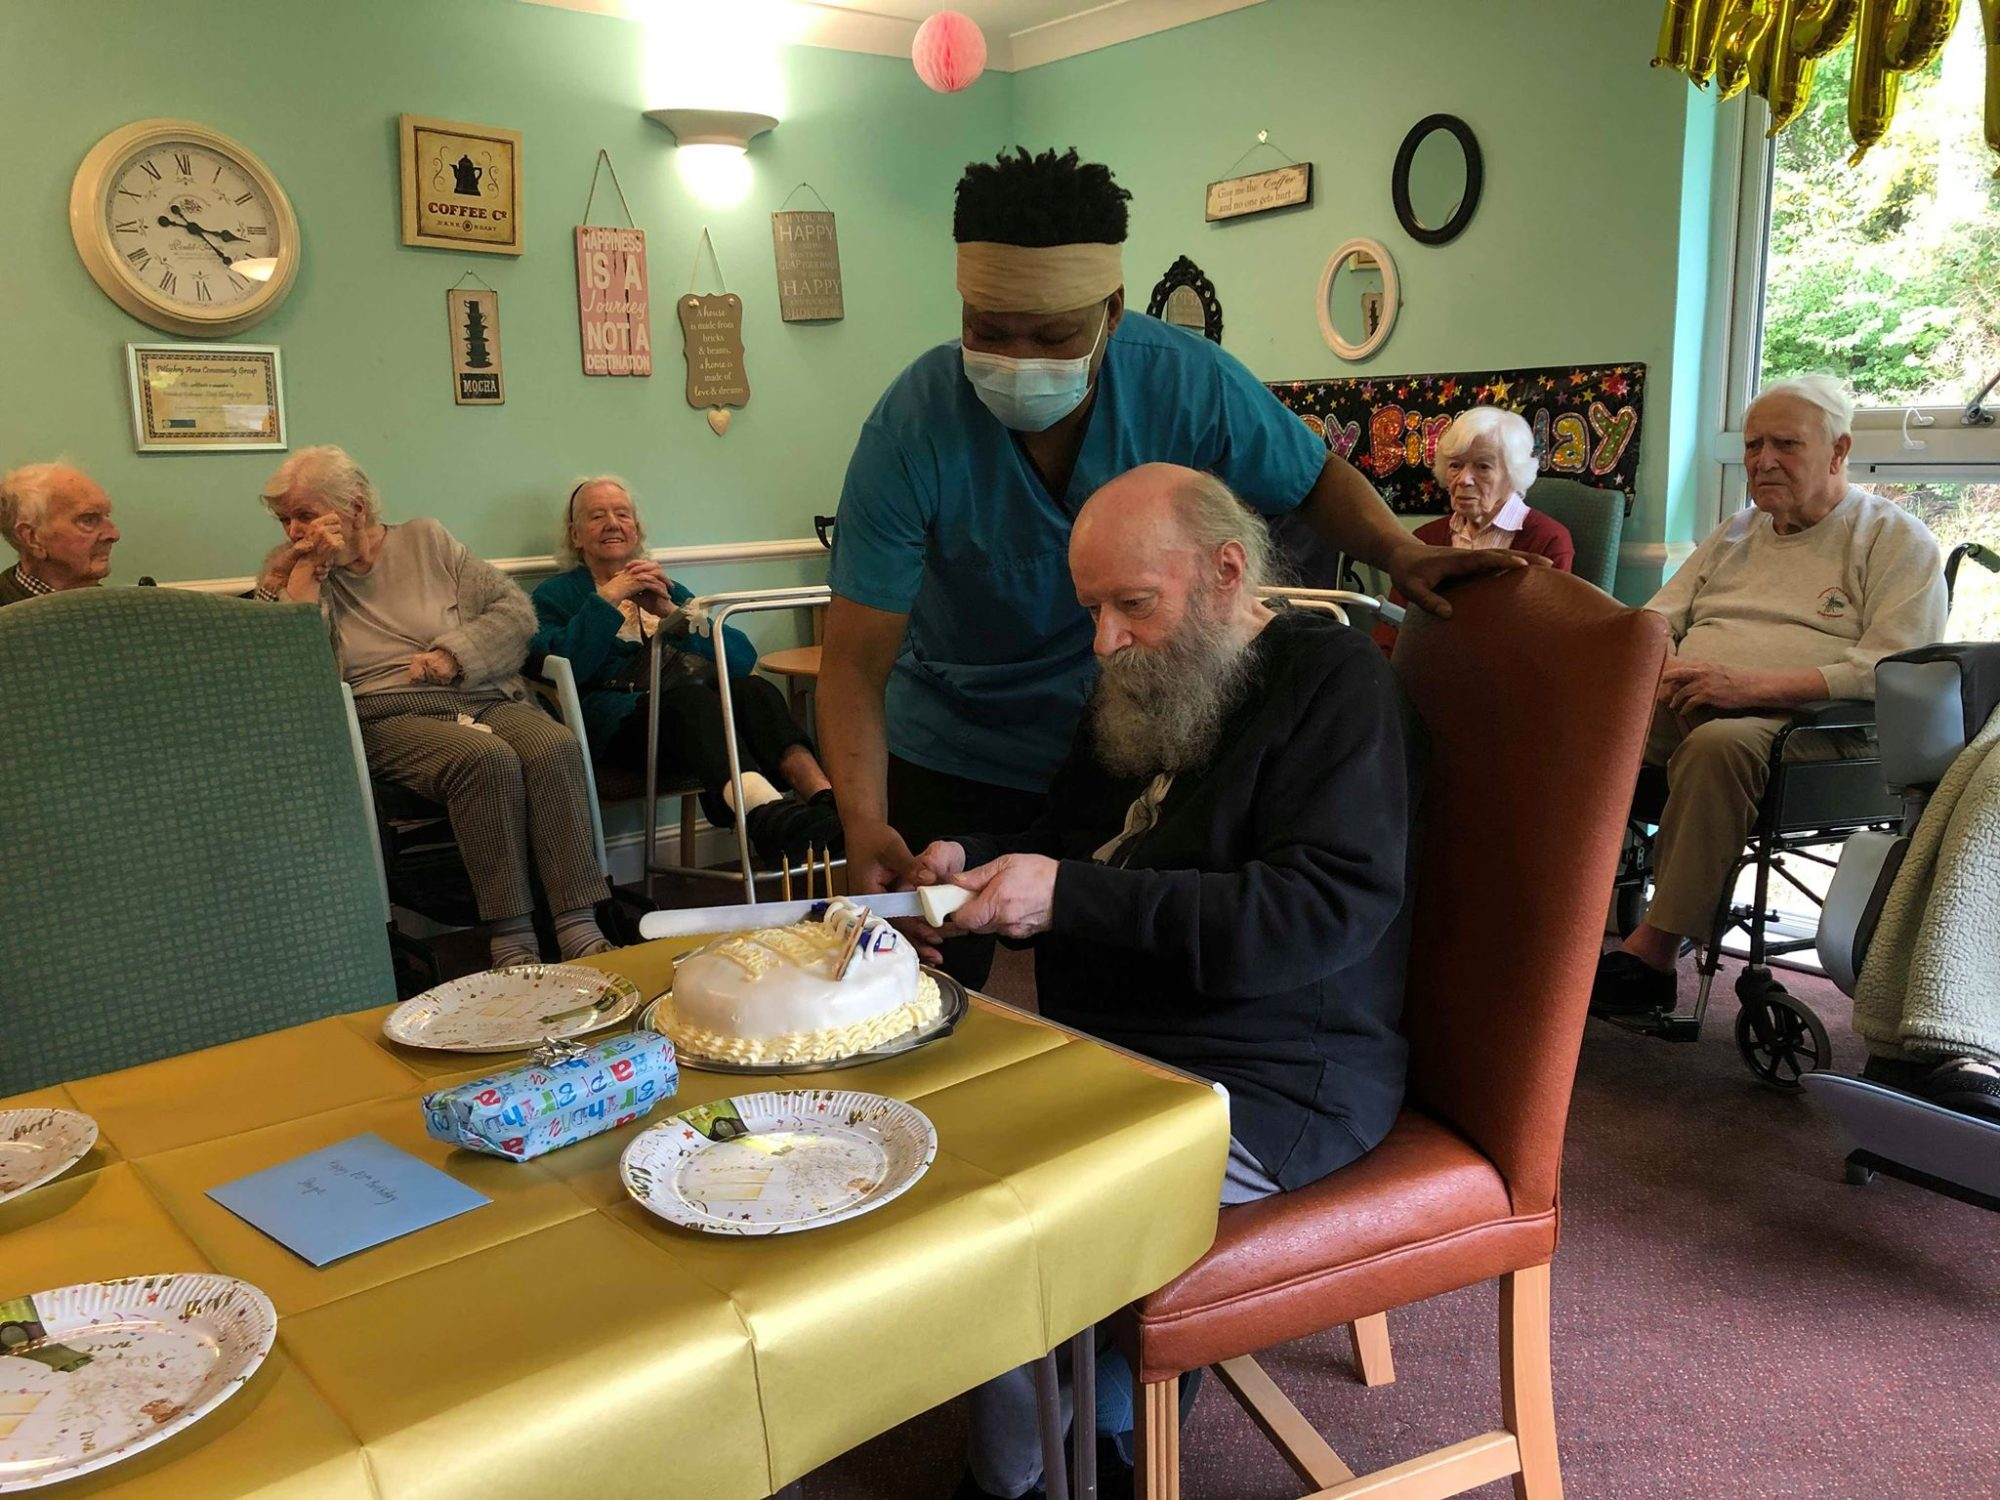 Resident Dougie celebrates turning 80 at Balhousie Pitlochry